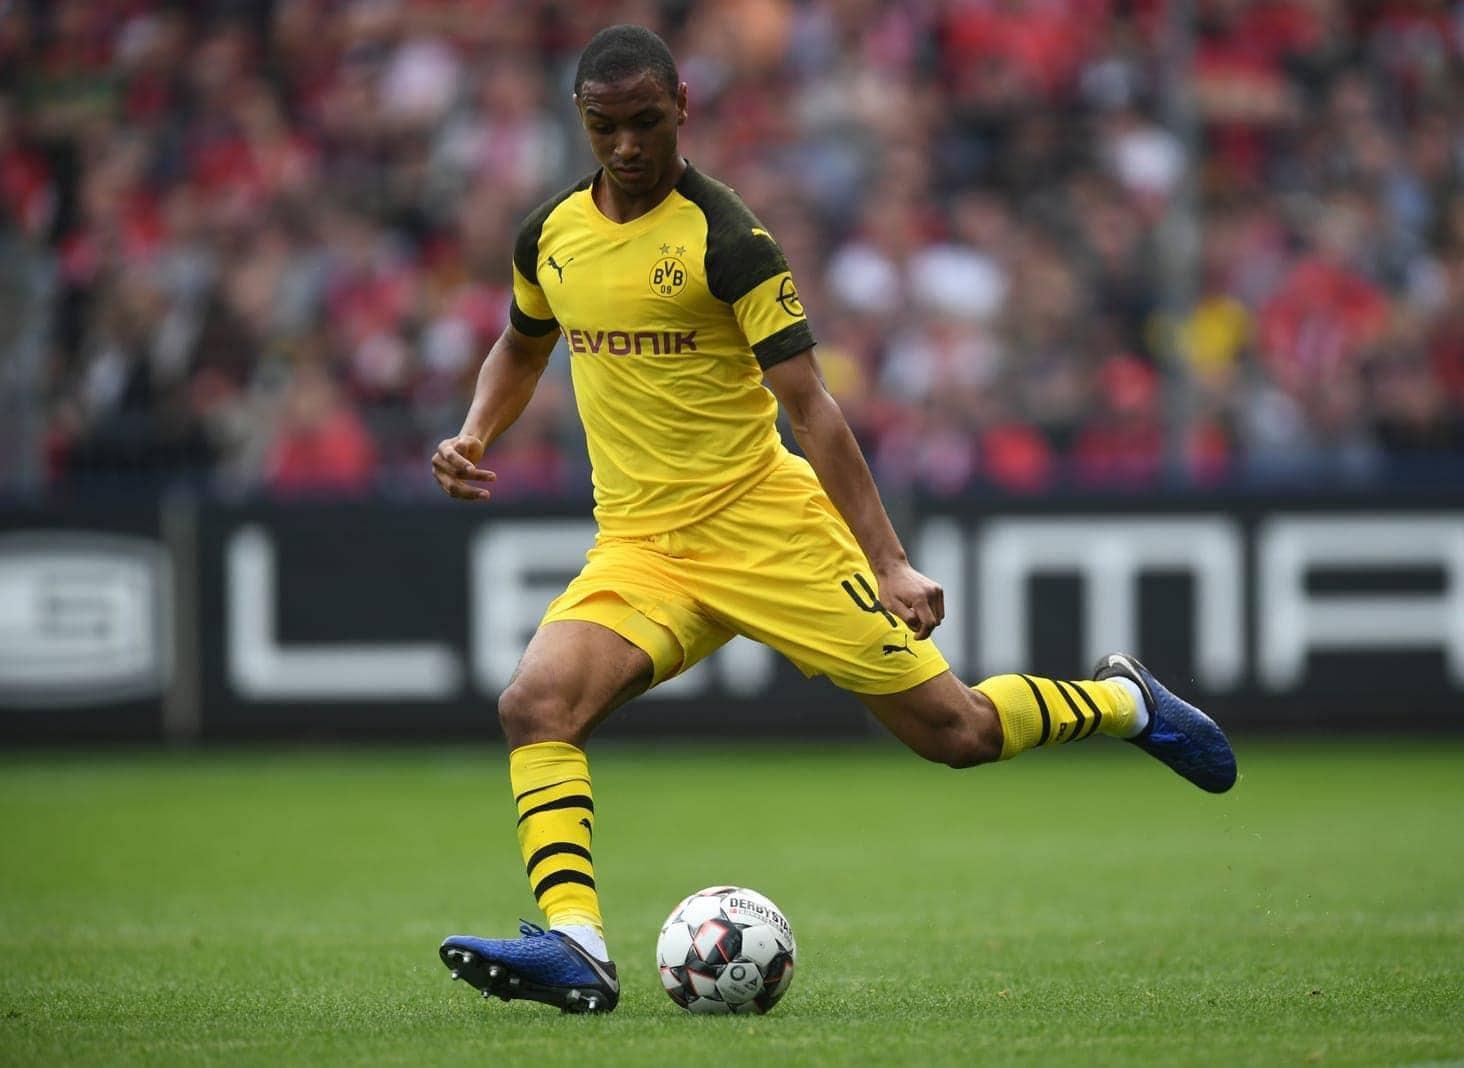 Abdou Diallo Borussia Dortmund Paris Saint-Germain